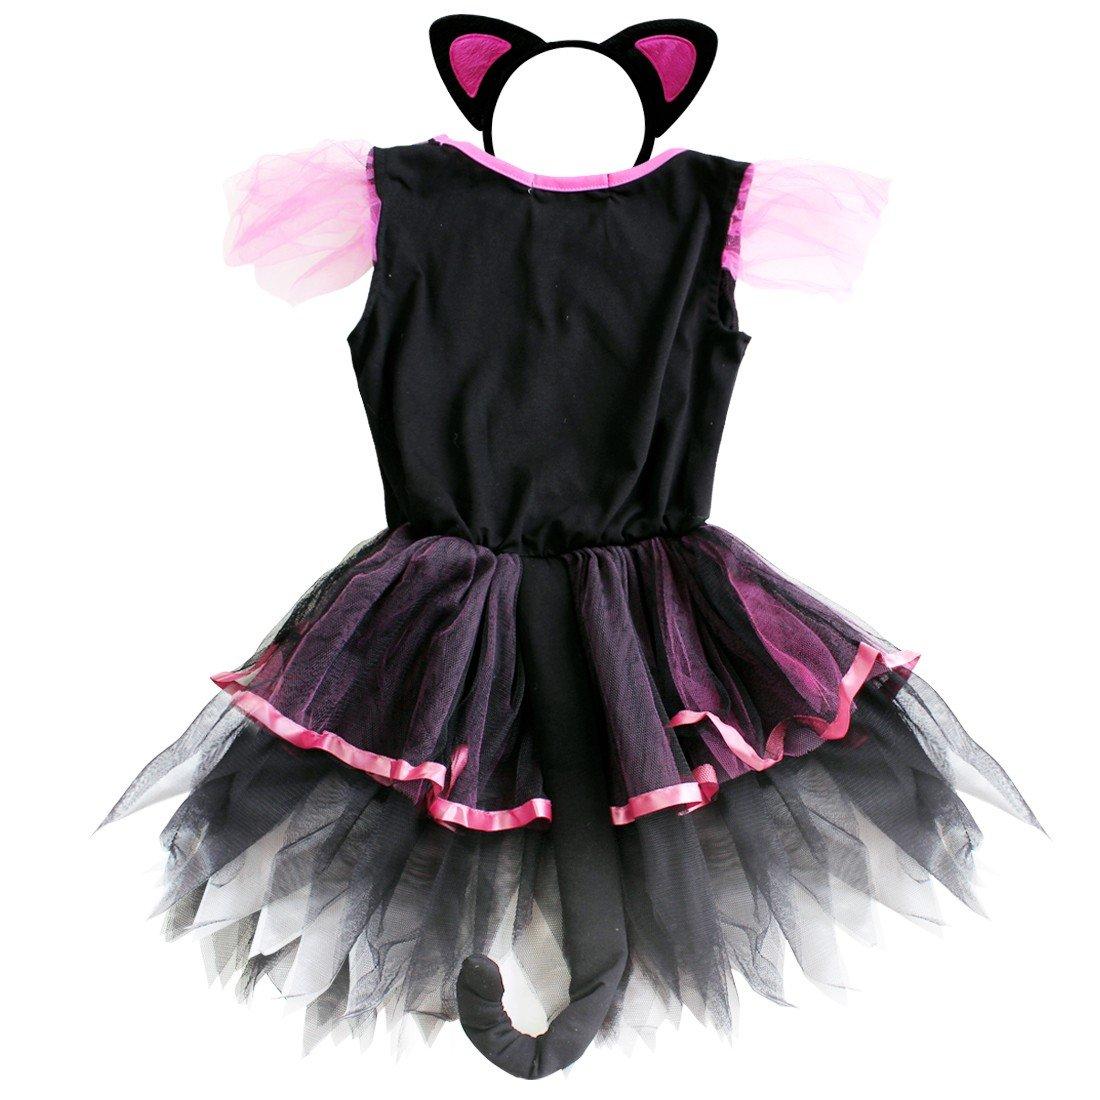 iEFiEL Girls Kitty Cat Animal Tutu Costume Dress Birthday Clothing